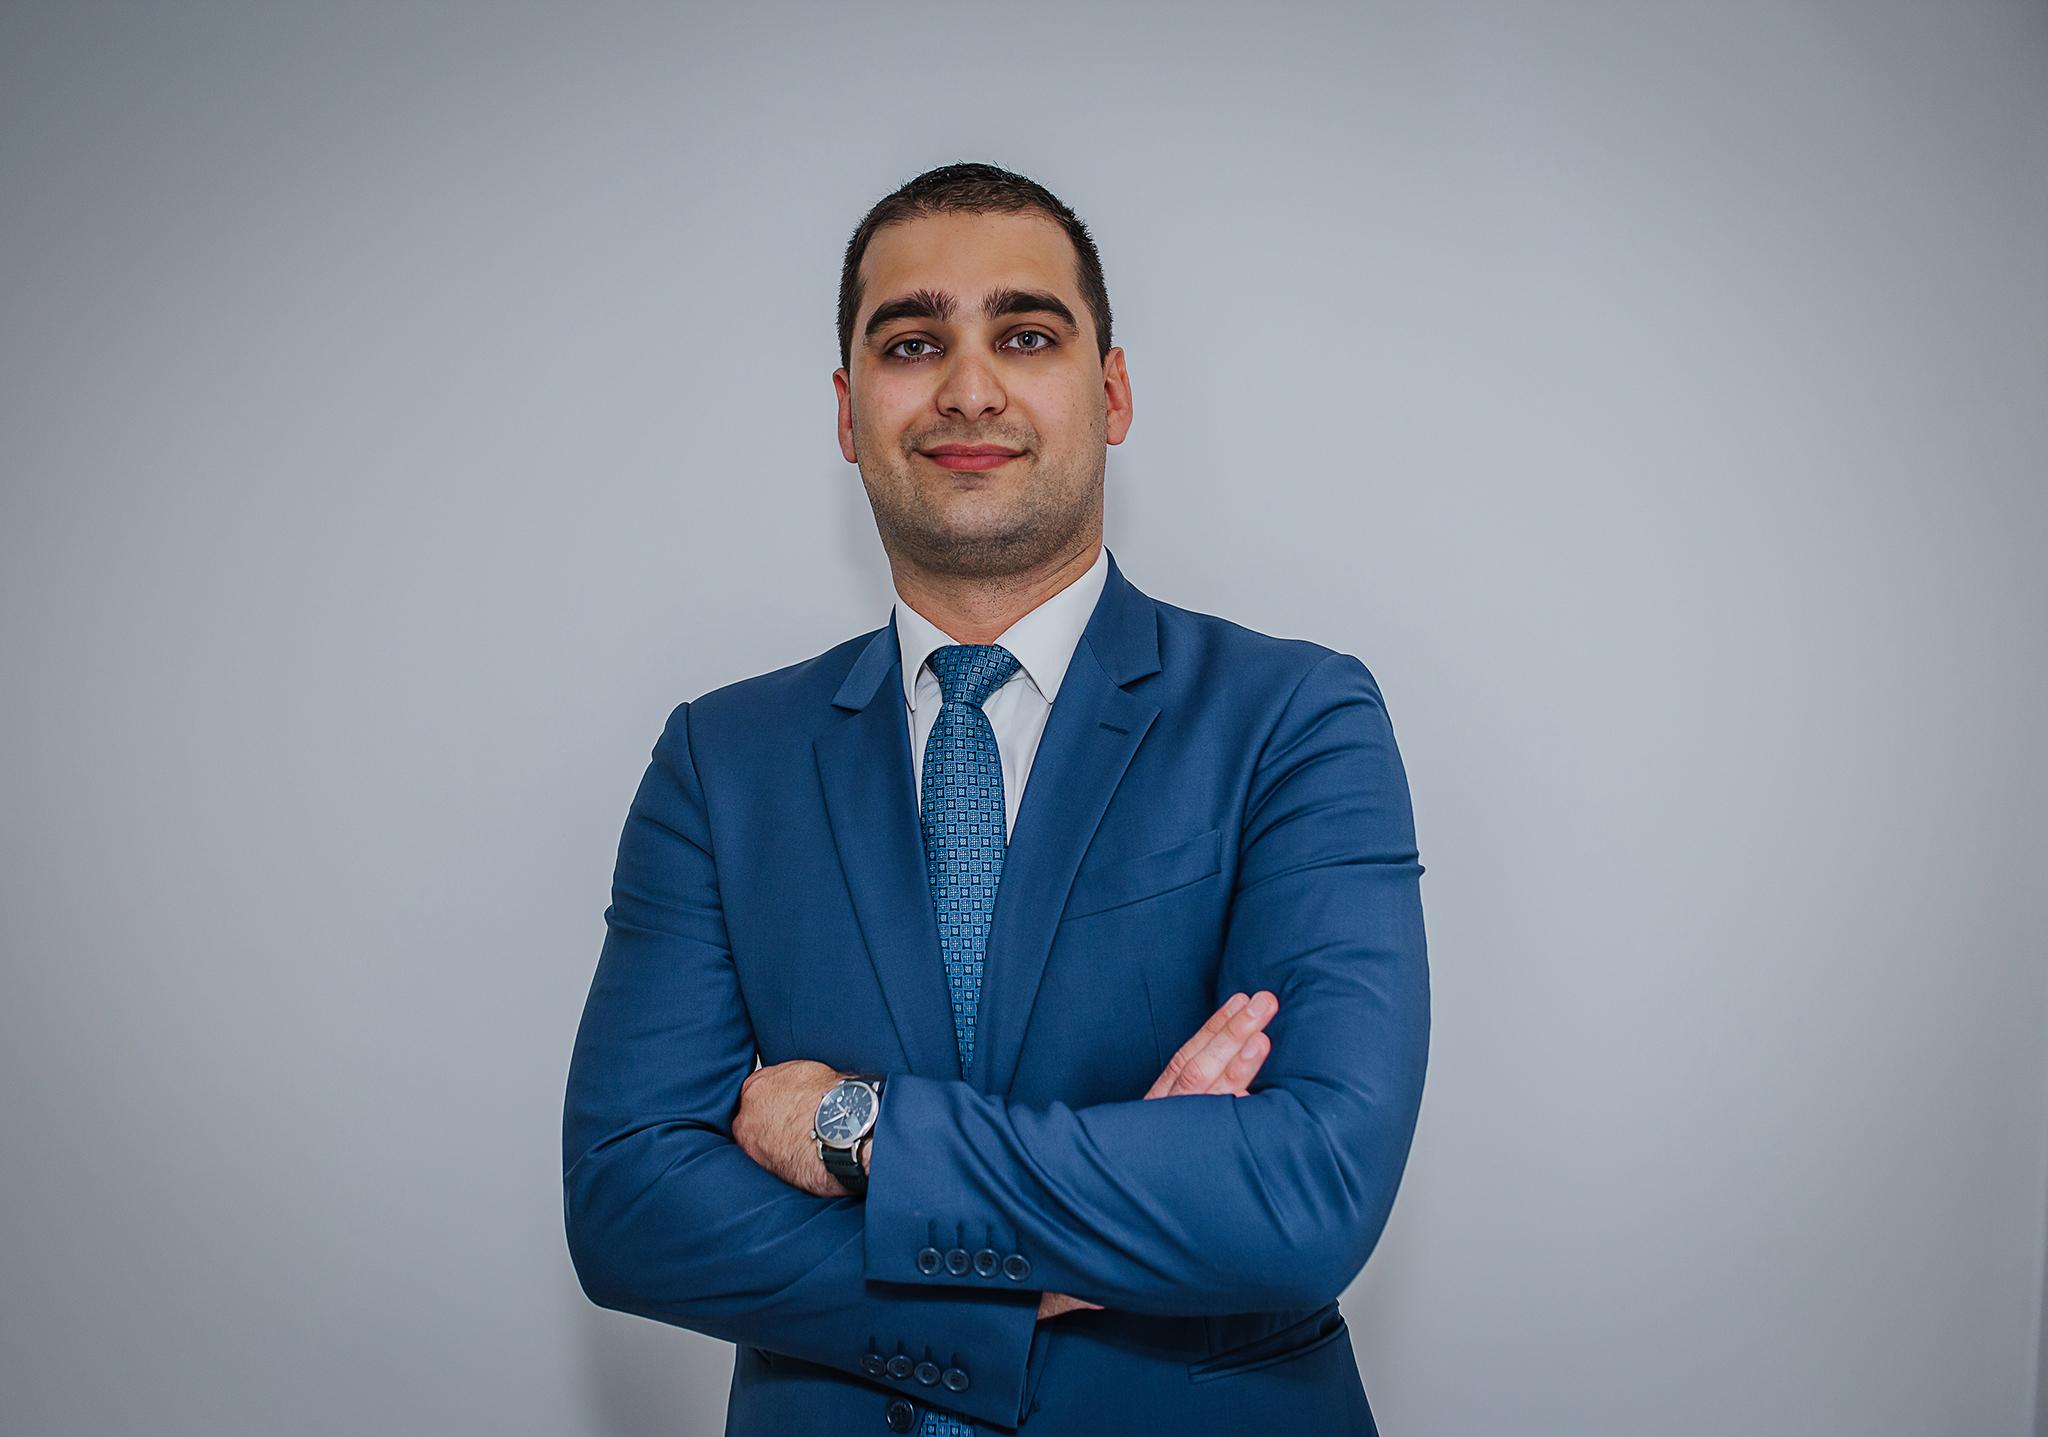 Bulgaristan avukat